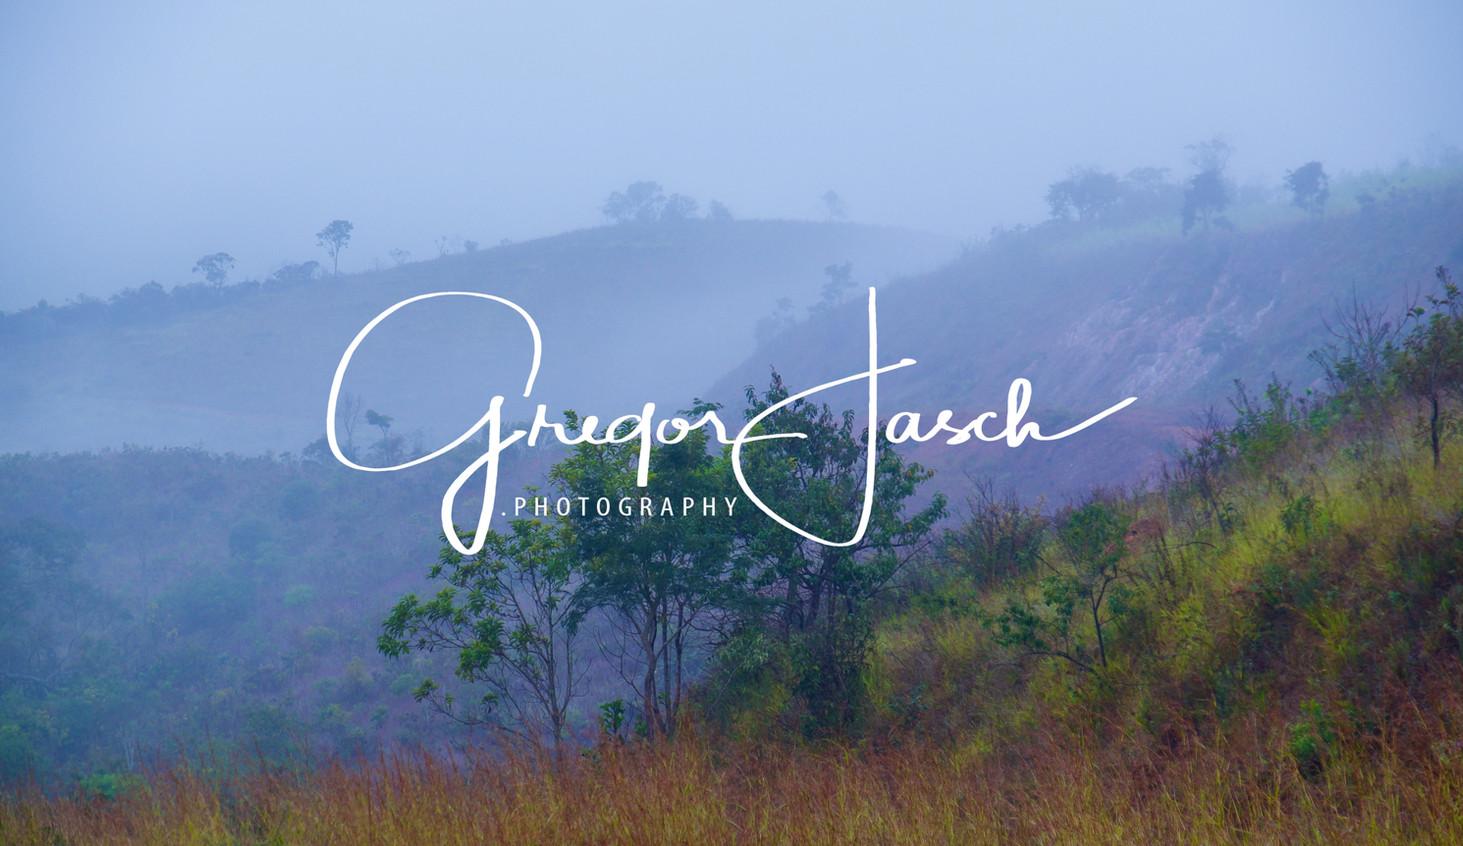 Buy_online_pictures_of_Outdoor_Rainforest_Brazil_gregorjasch.photography